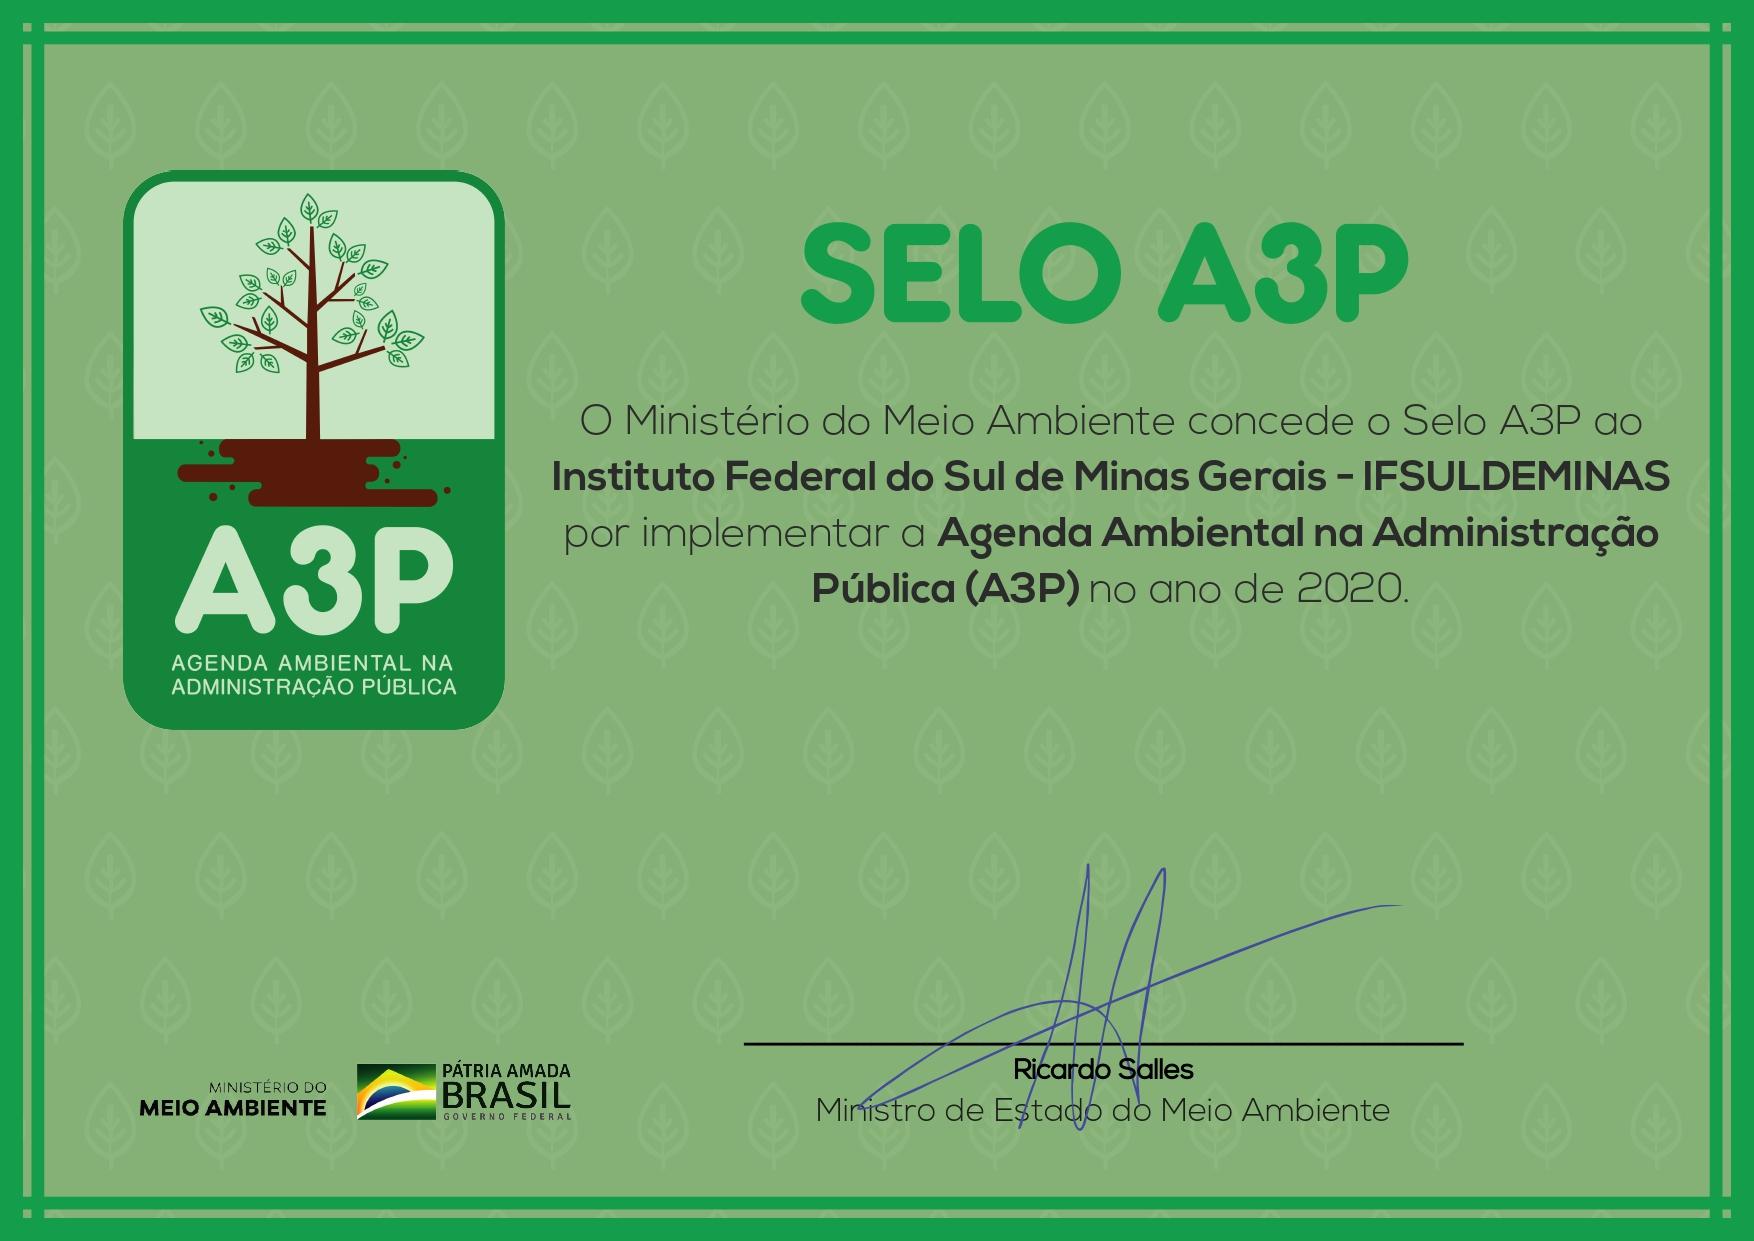 selo a3p